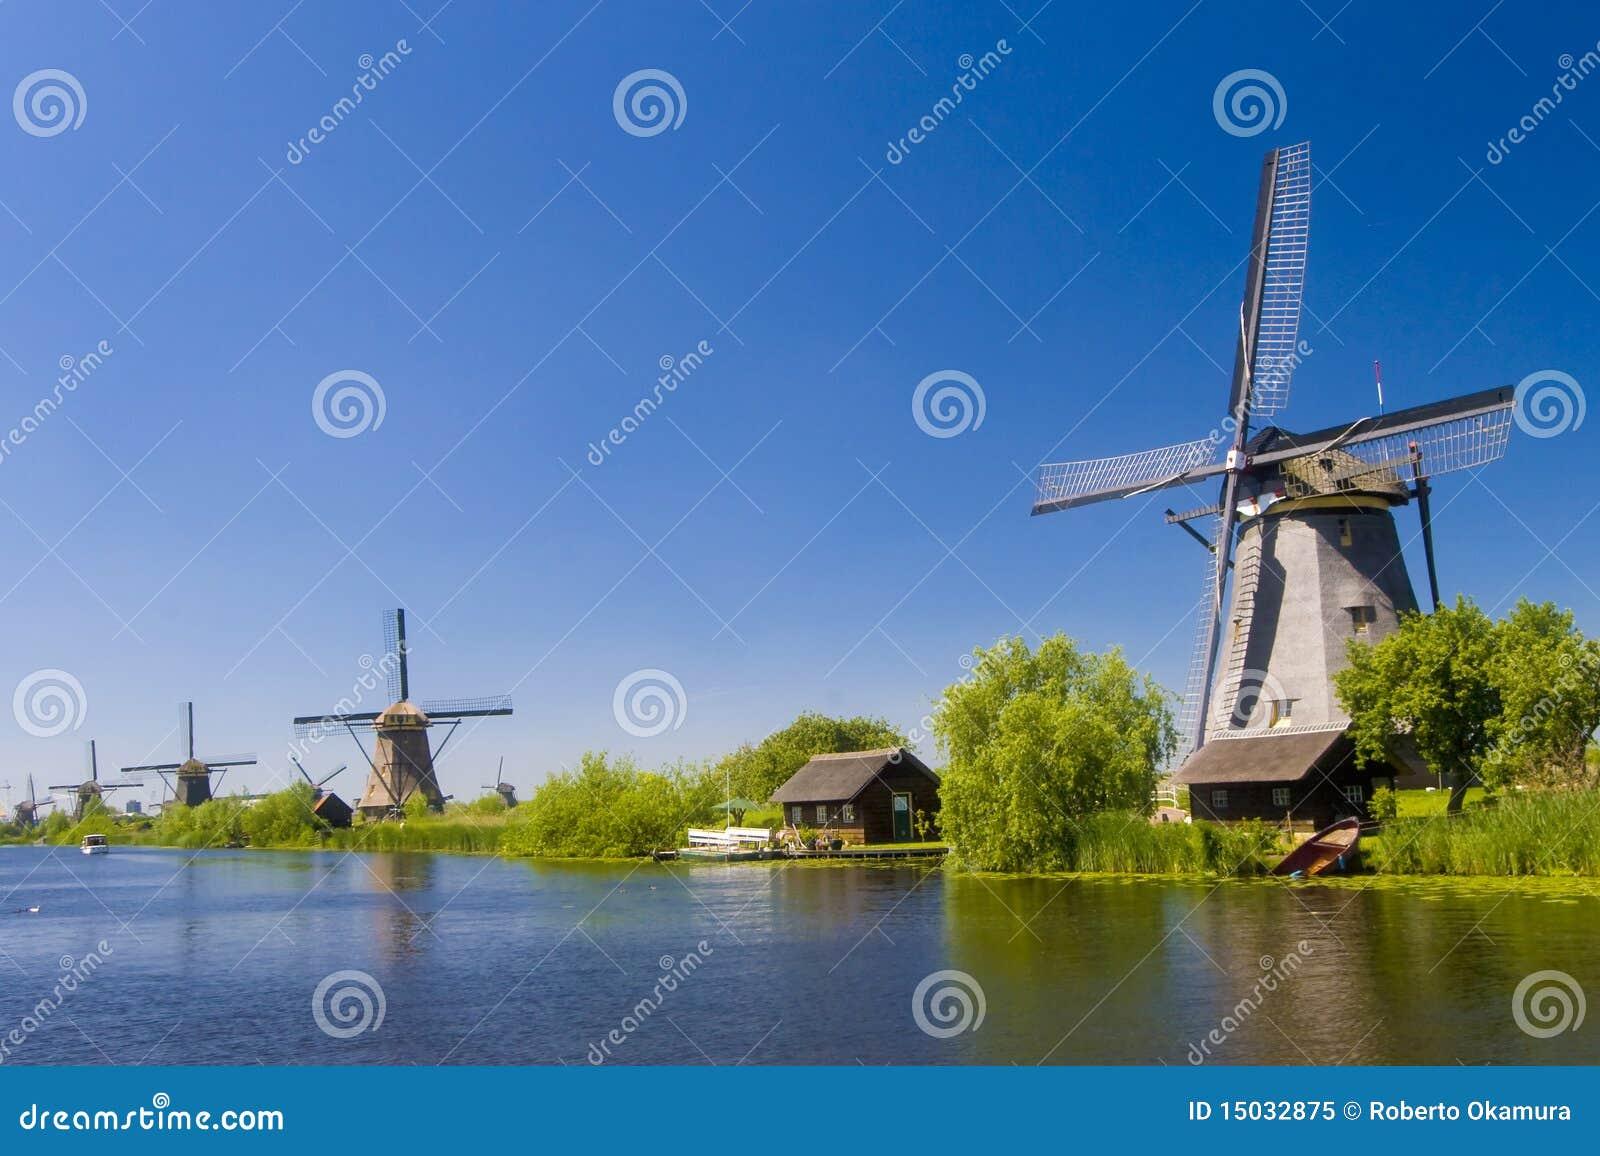 Kinderdijk Windmühlen 2